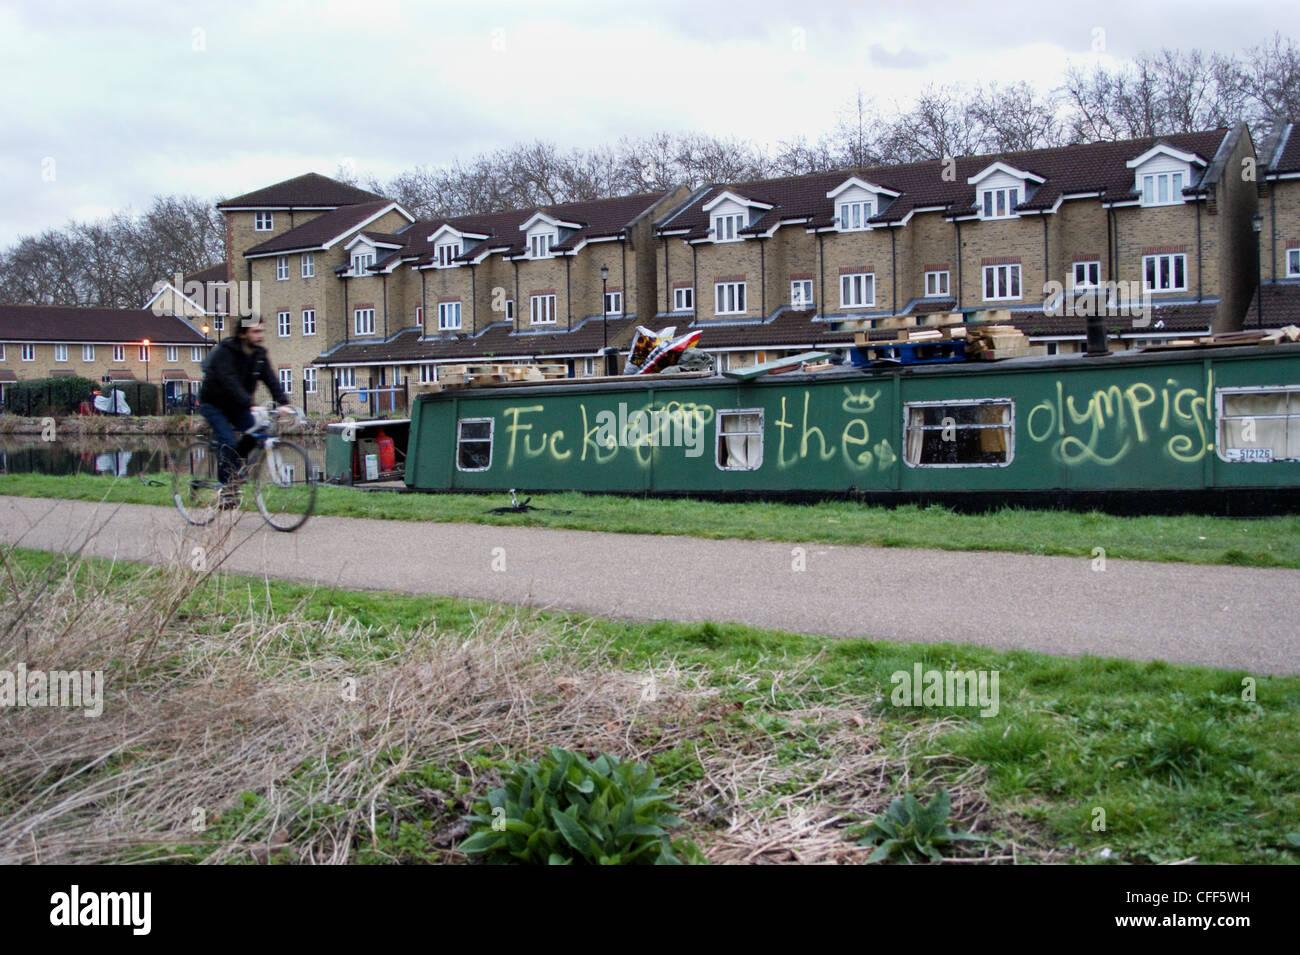 a-cyclist-passes-graffiti-on-narrowboat-